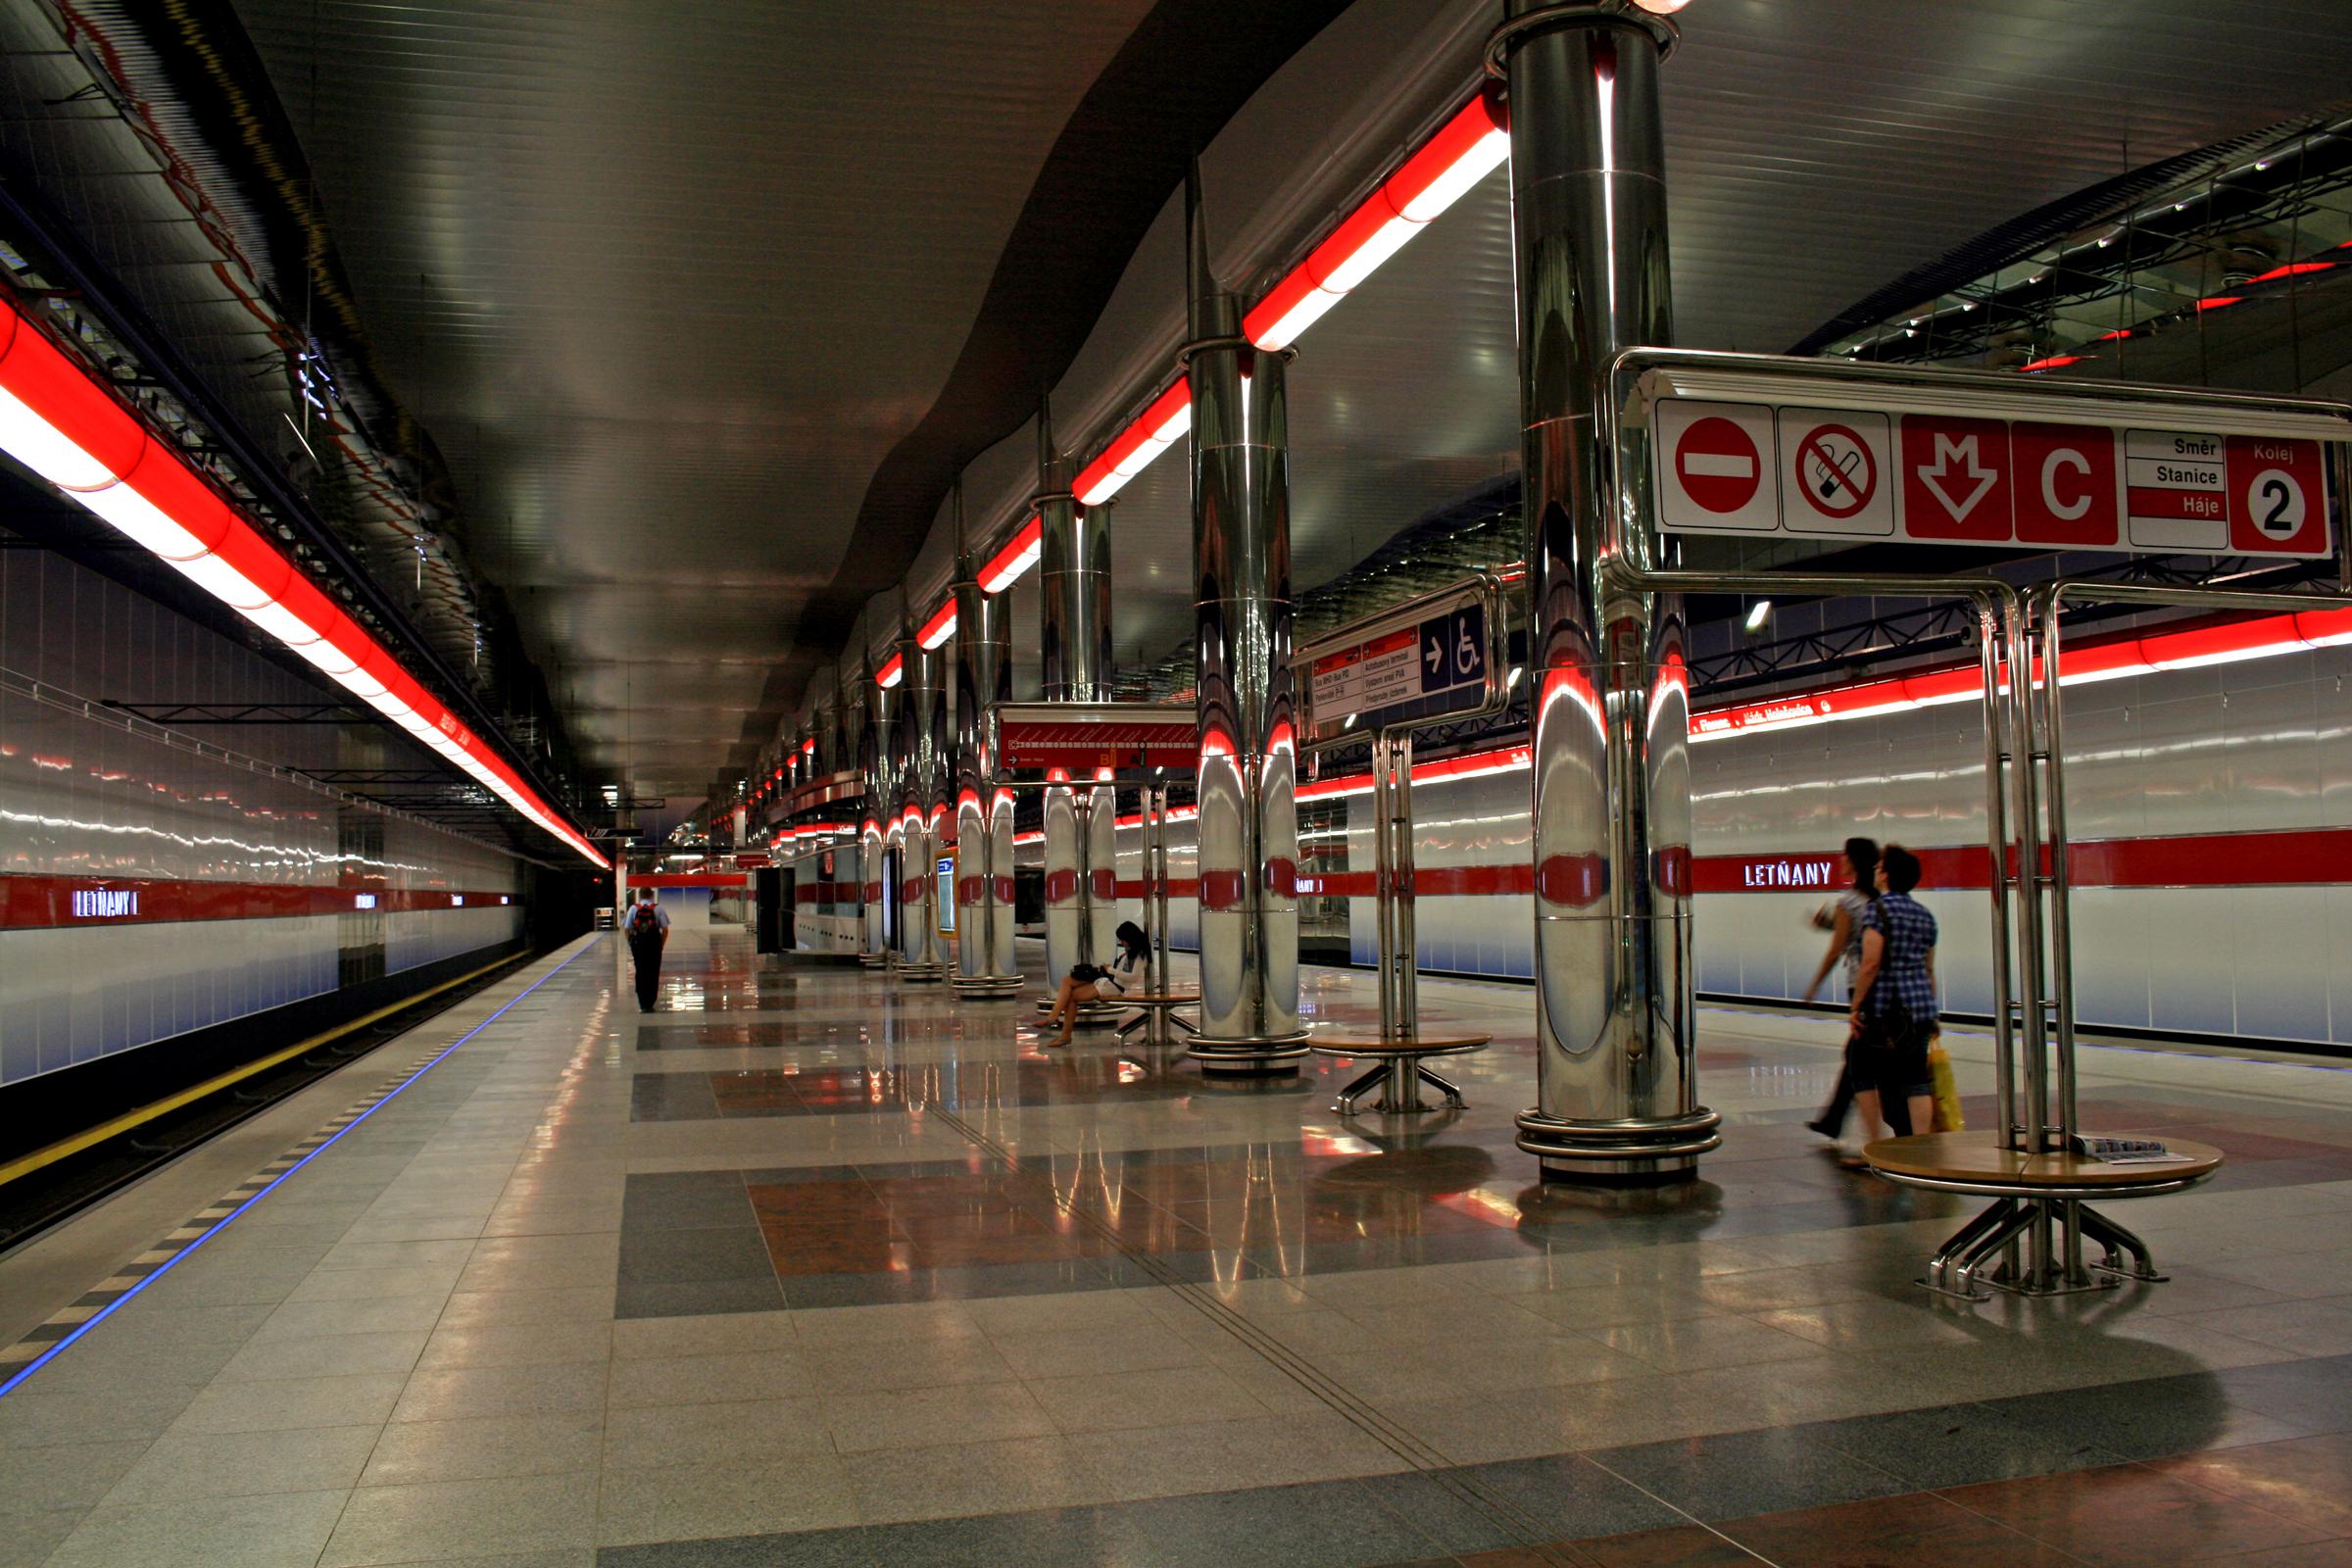 Metro_Letňany_1